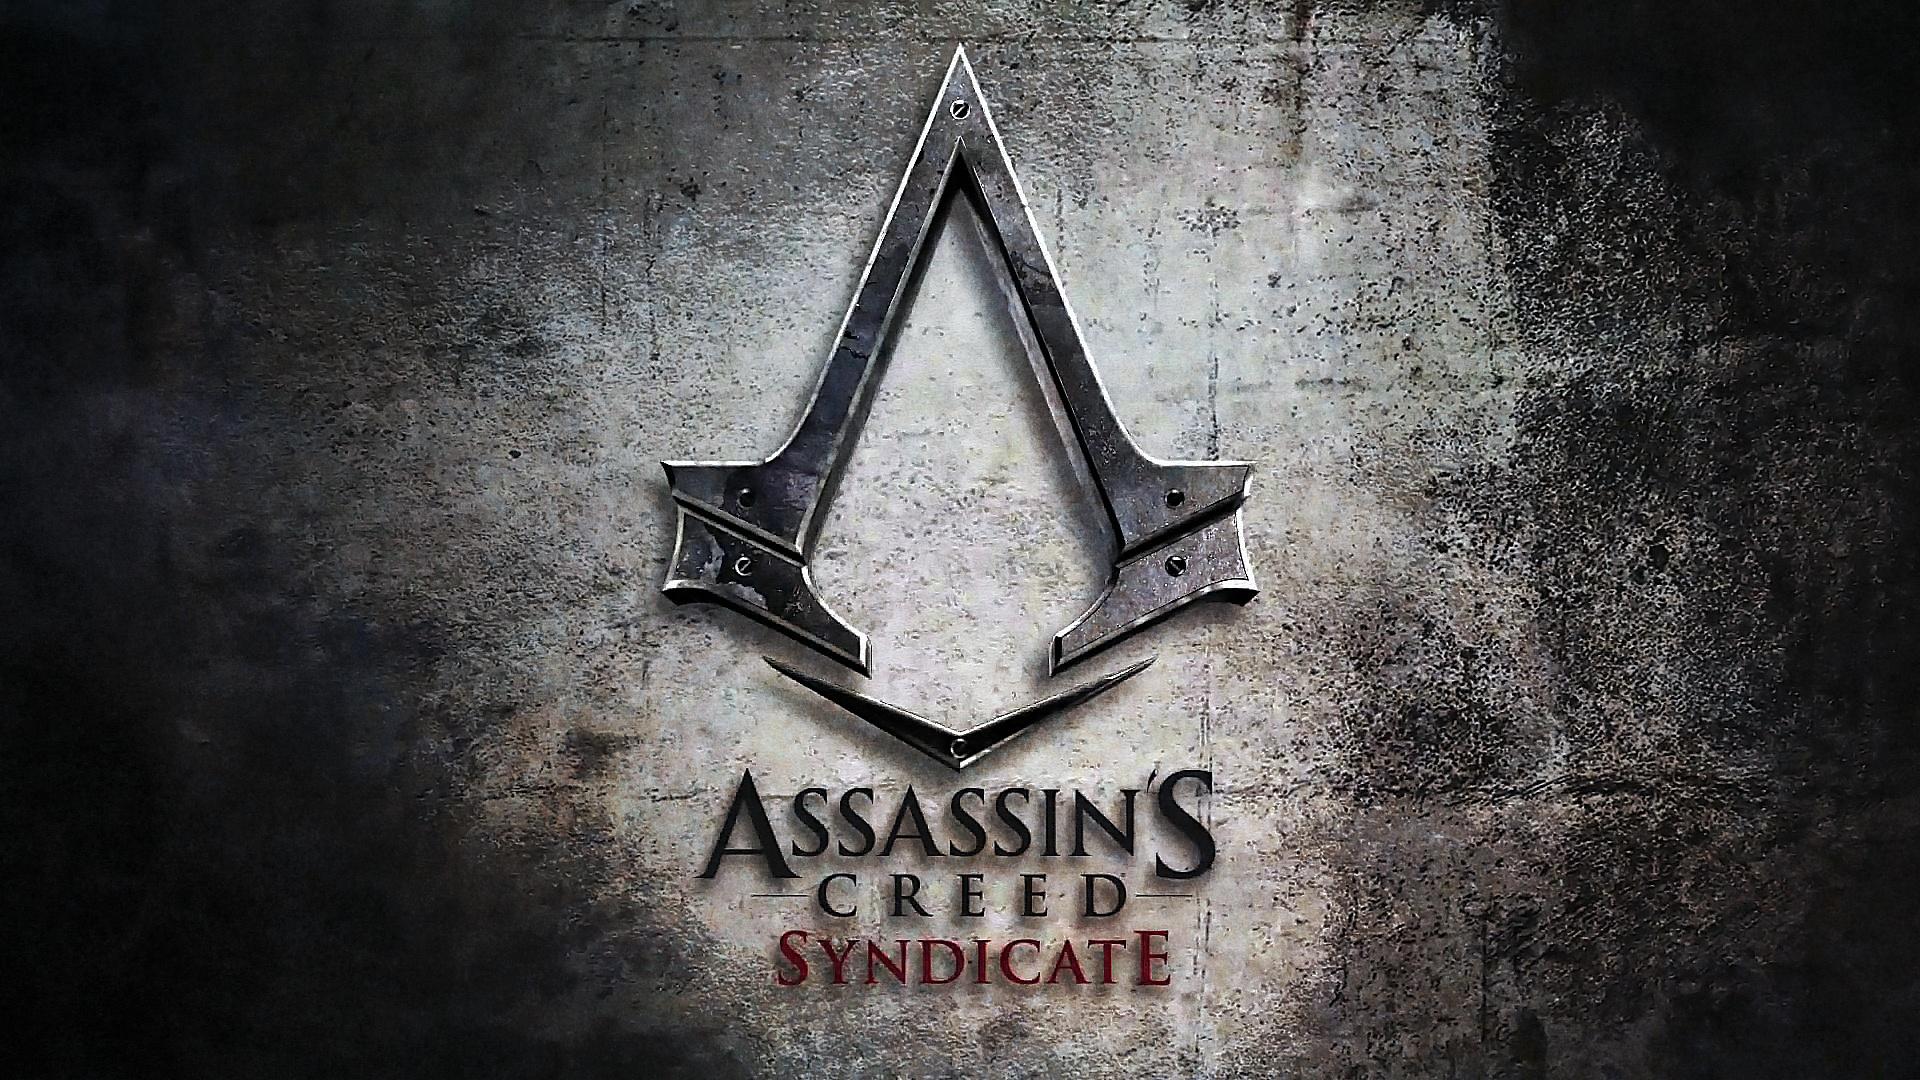 assassins_creed_syndicate-logo-wallpaper-1920x1080